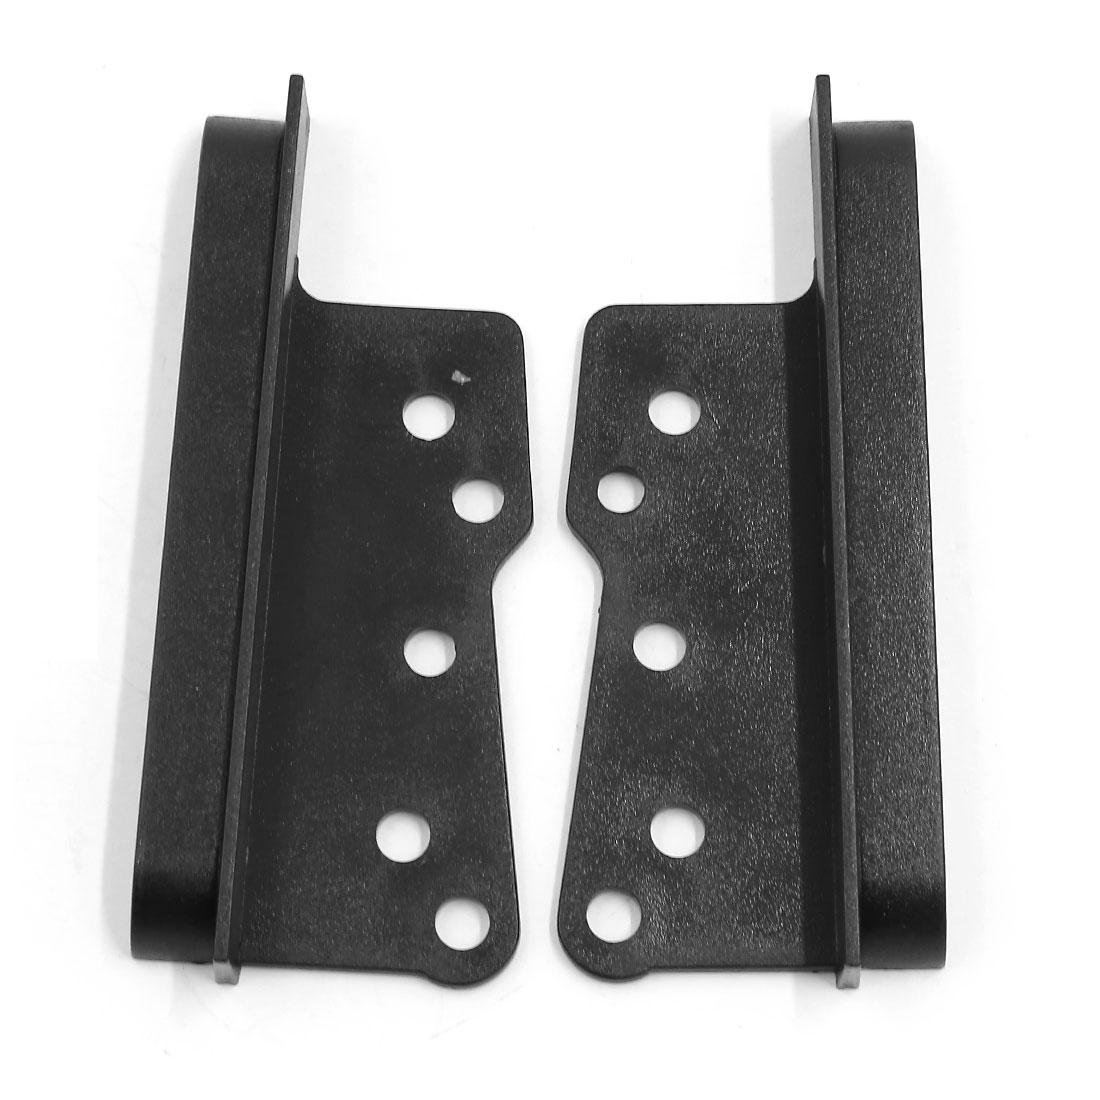 2 Pcs Black Plastic Car DVD Panel Trim Audio Stereo Frame Bracket for Toyota